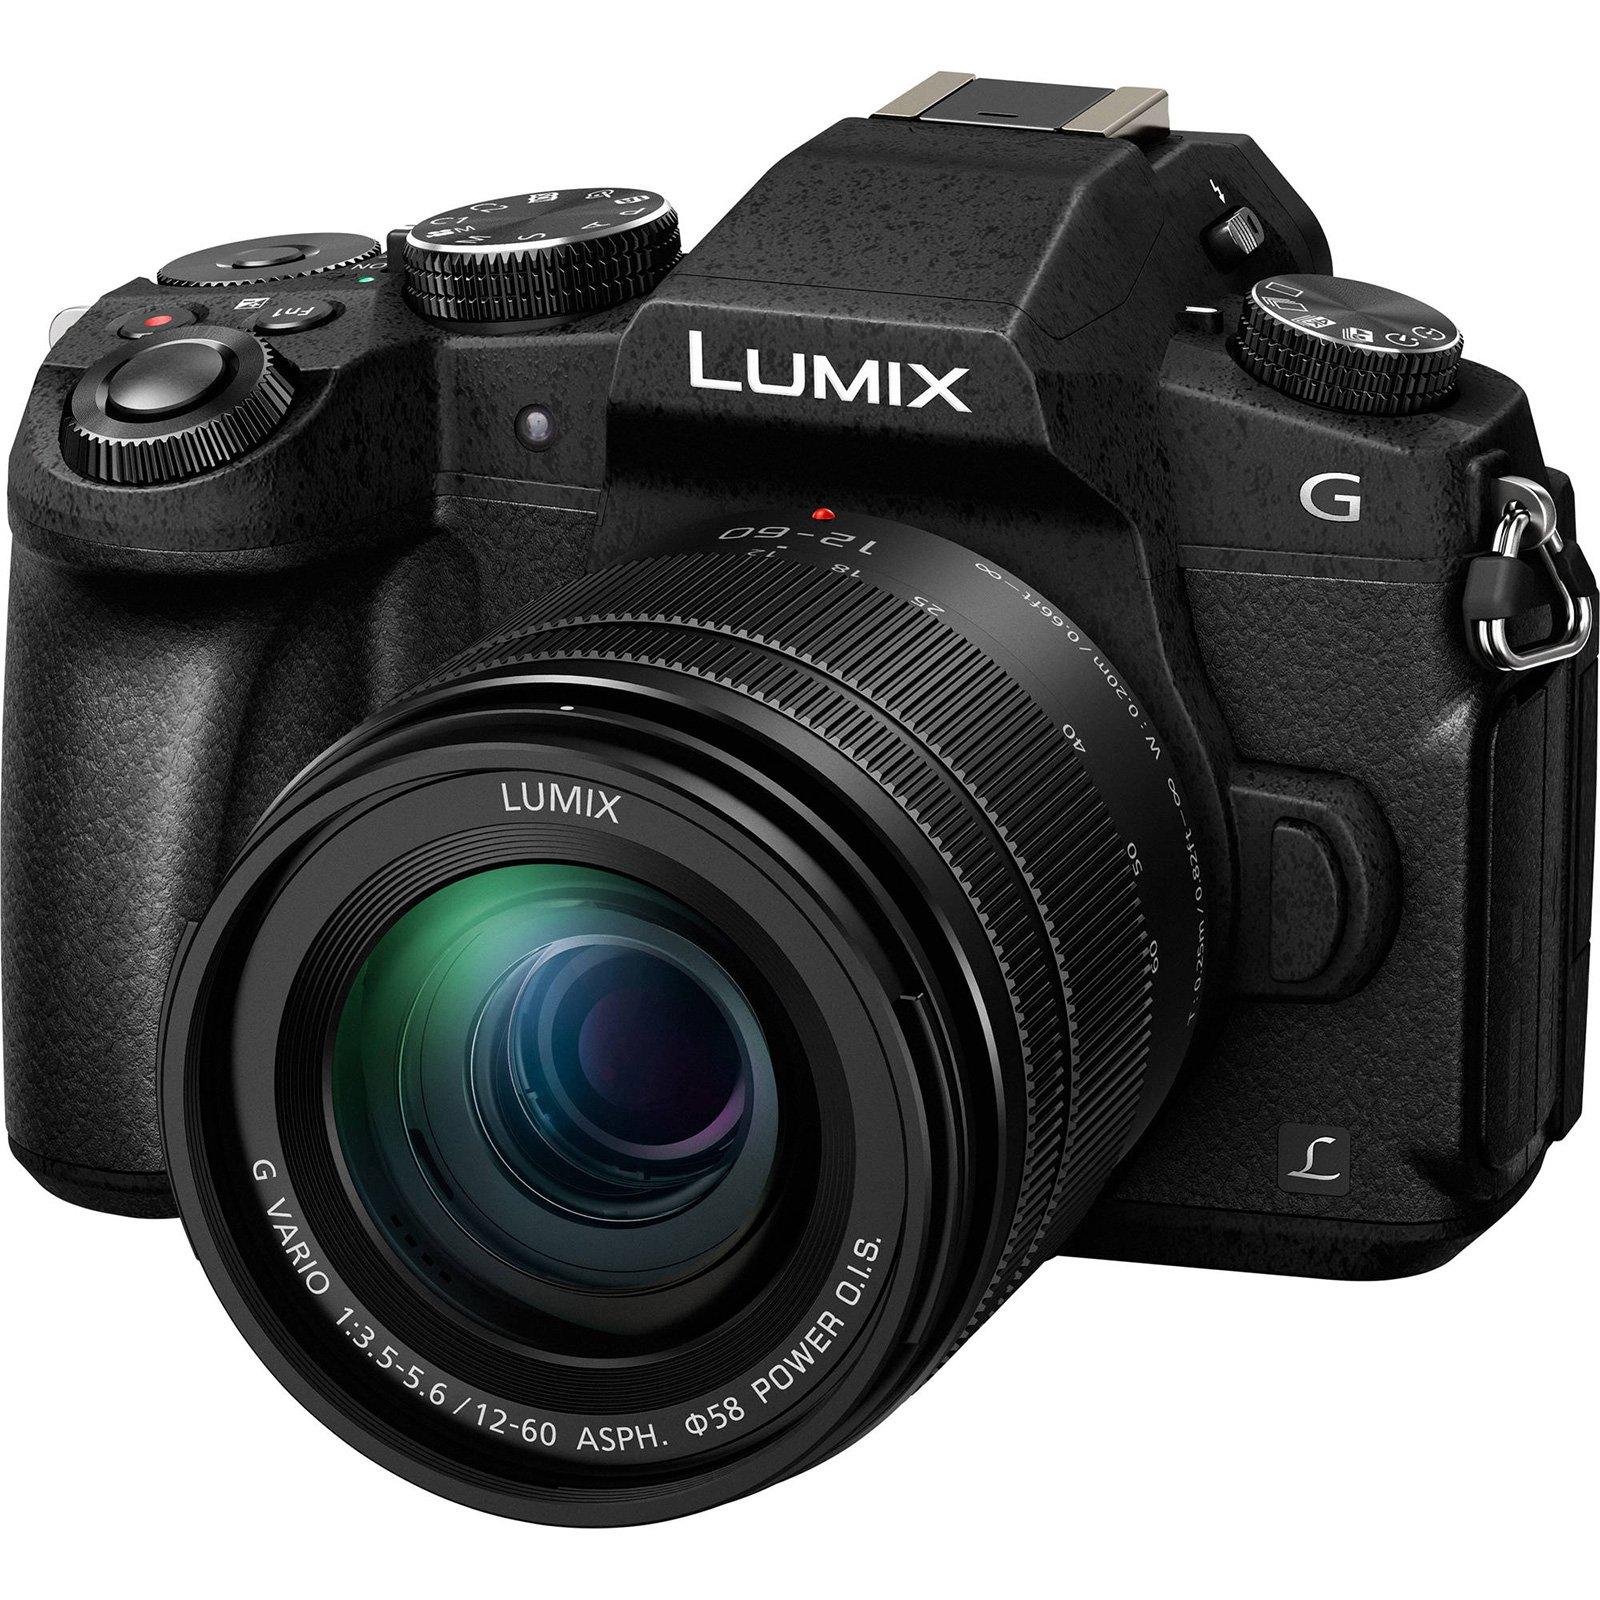 Panasonic Lumix DMC-G85 4K Wi-Fi Digital Camera & 12-60mm Lens with 64GB Card + Battery & Charger + Case + Tripod + Filter + Tele & Wide Lens Kit by Panasonic (Image #2)